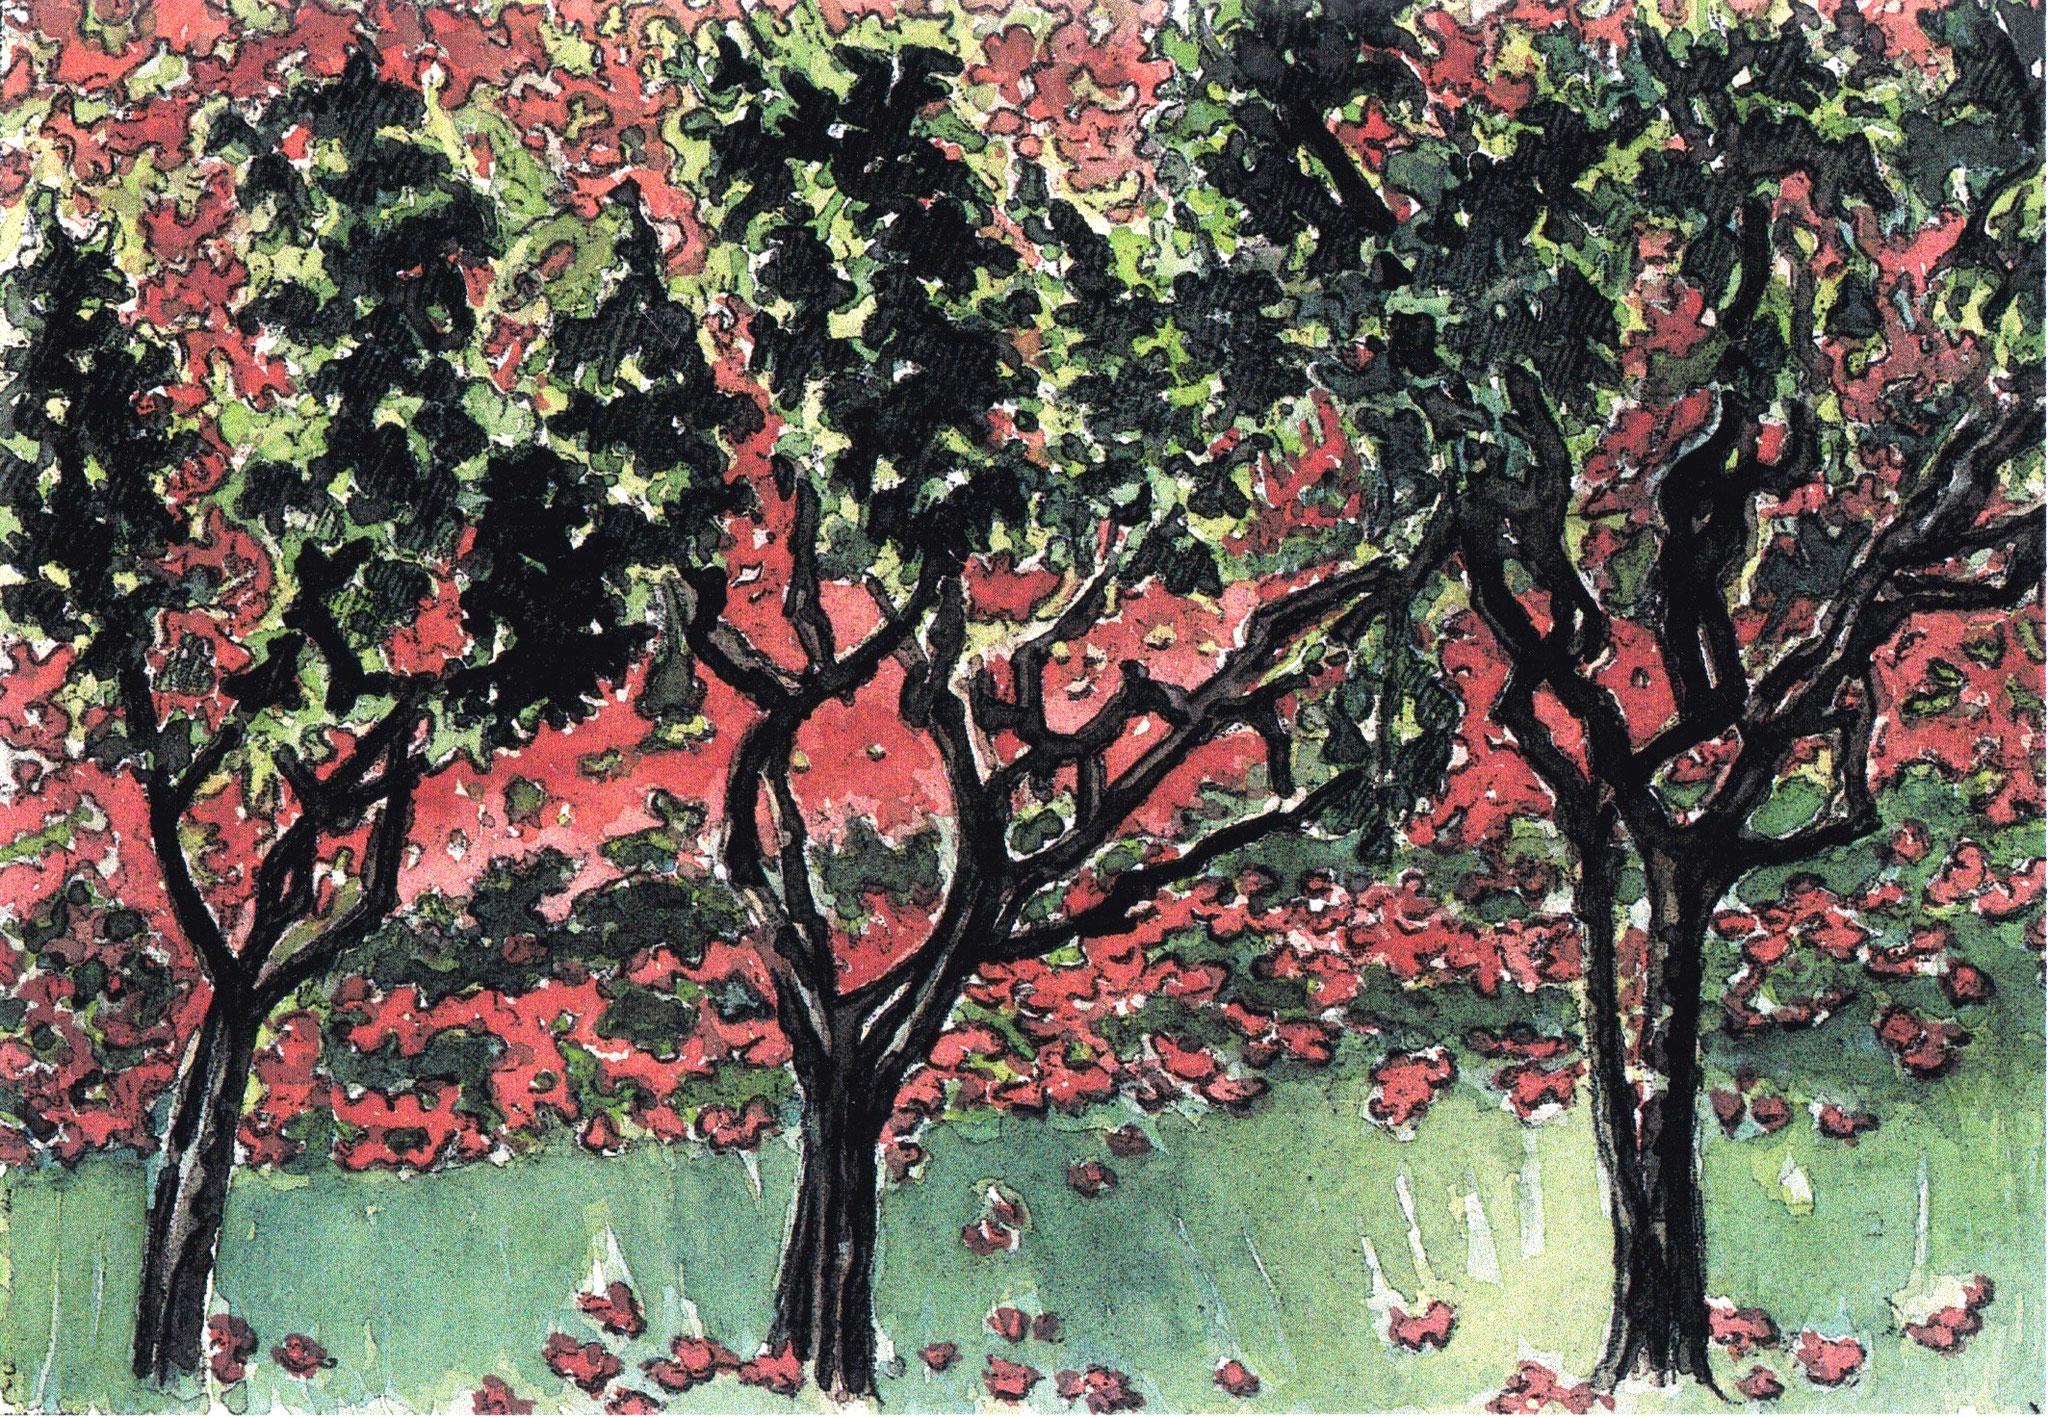 ' Olivenhain ' Aquarell/Pittstift, 17 x 22 cm, 2006